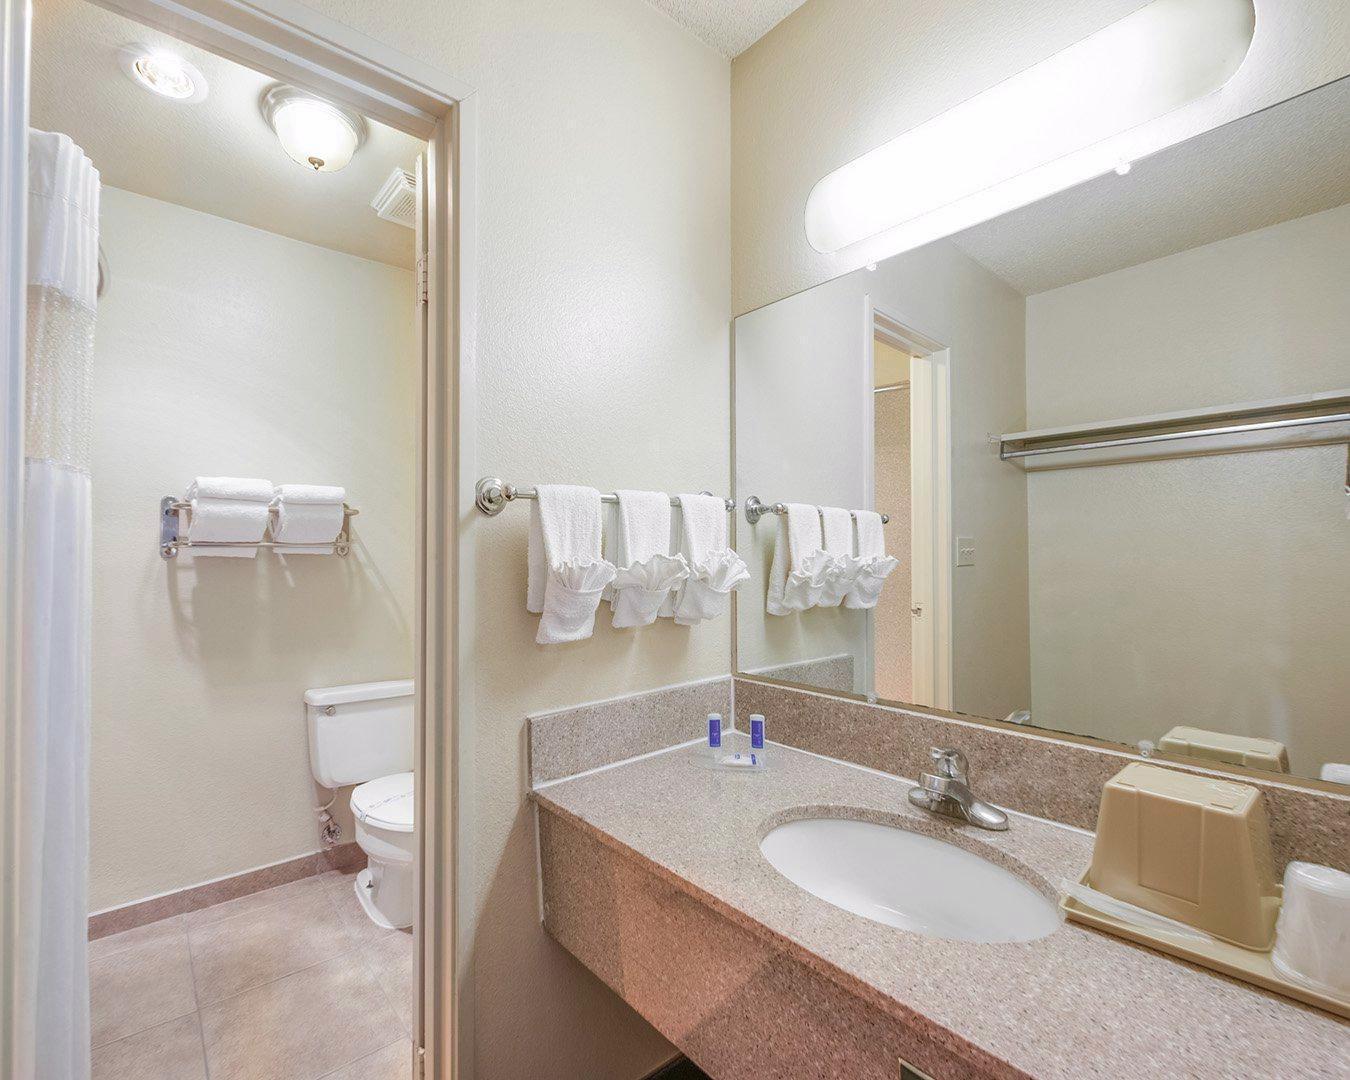 2 Queen Beds Suite No Smoking Rodeway Inn and Suites